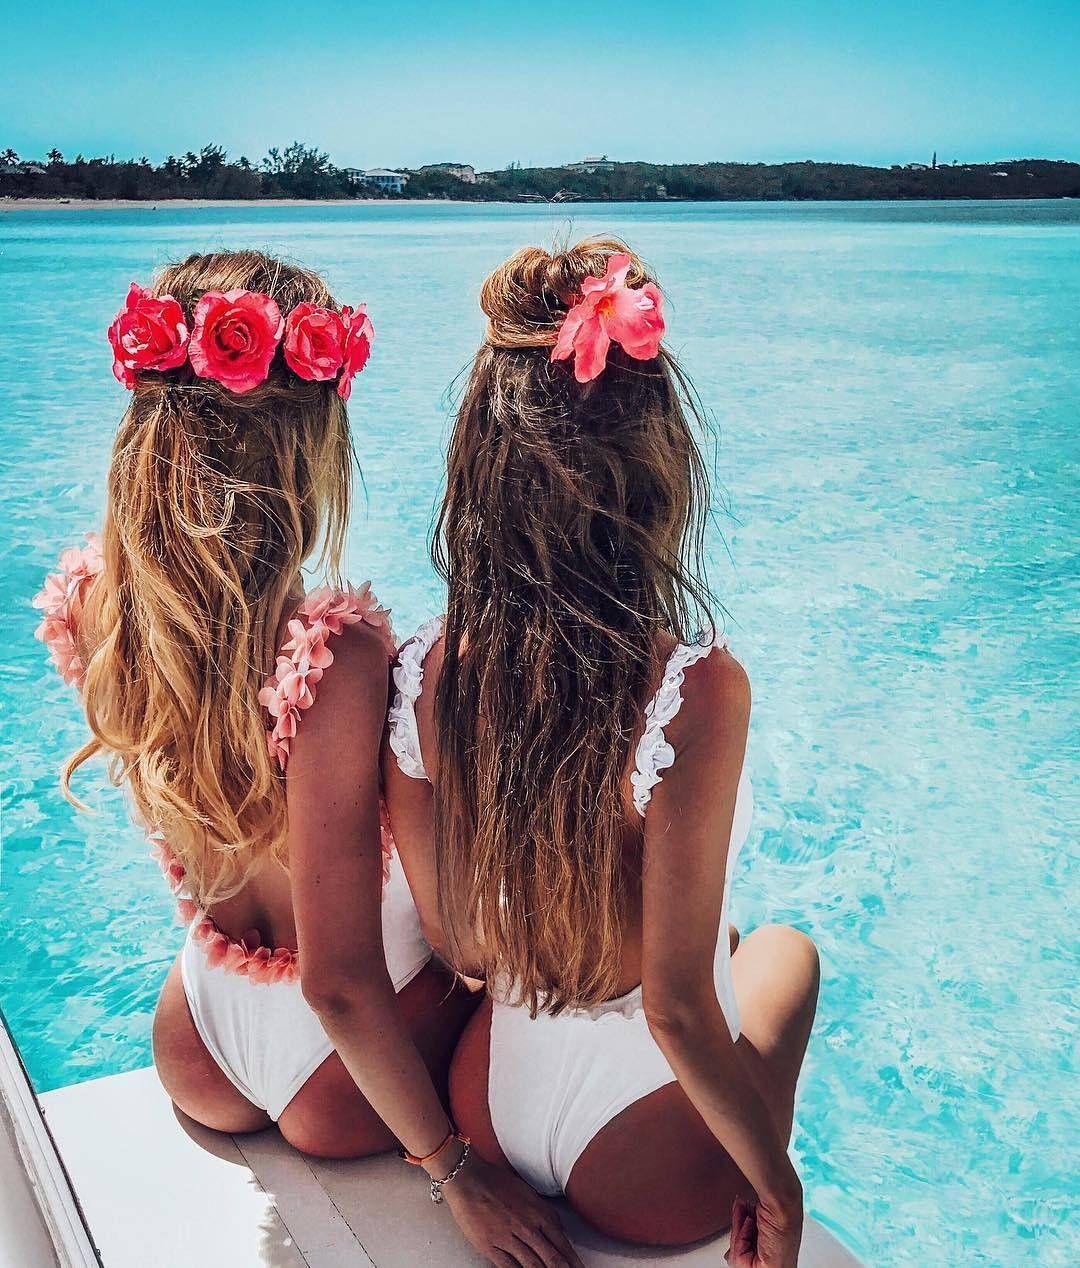 Beach hair style ideas long hairstyles loose waves curls